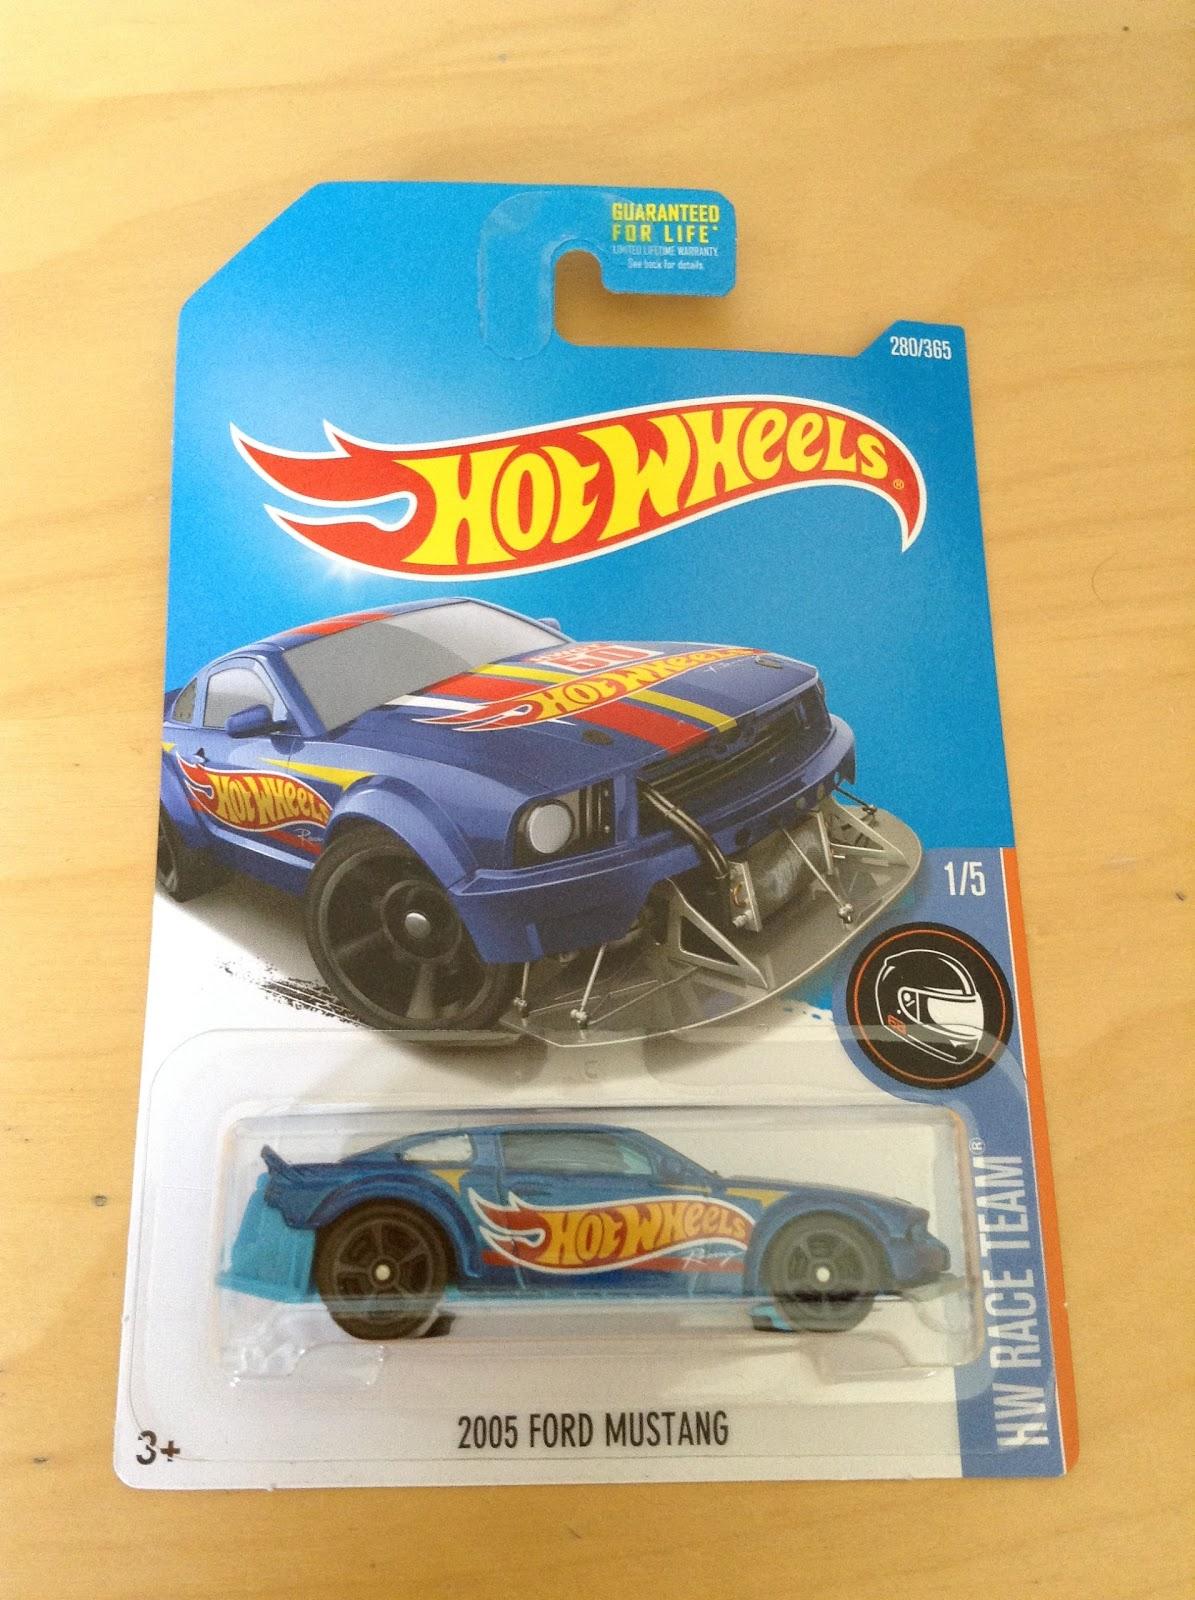 Julian's Hot Wheels Blog: 2005 Ford Mustang (2017 HW Race Team)